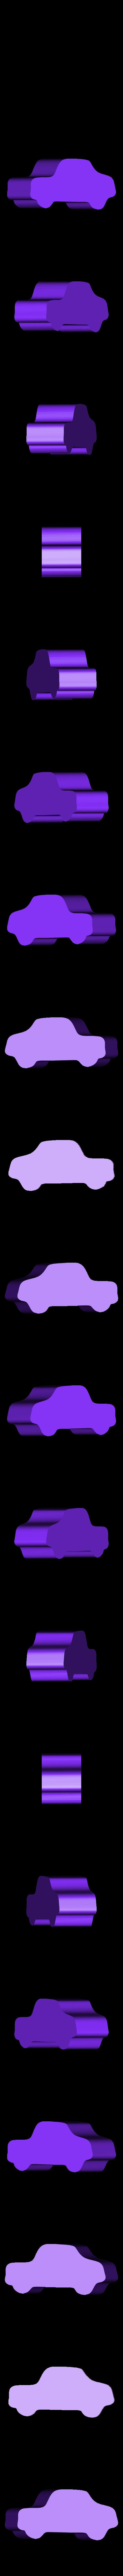 auto.STL Download free STL file Cookie cutters! • 3D print design, MaterialsToBuils3D